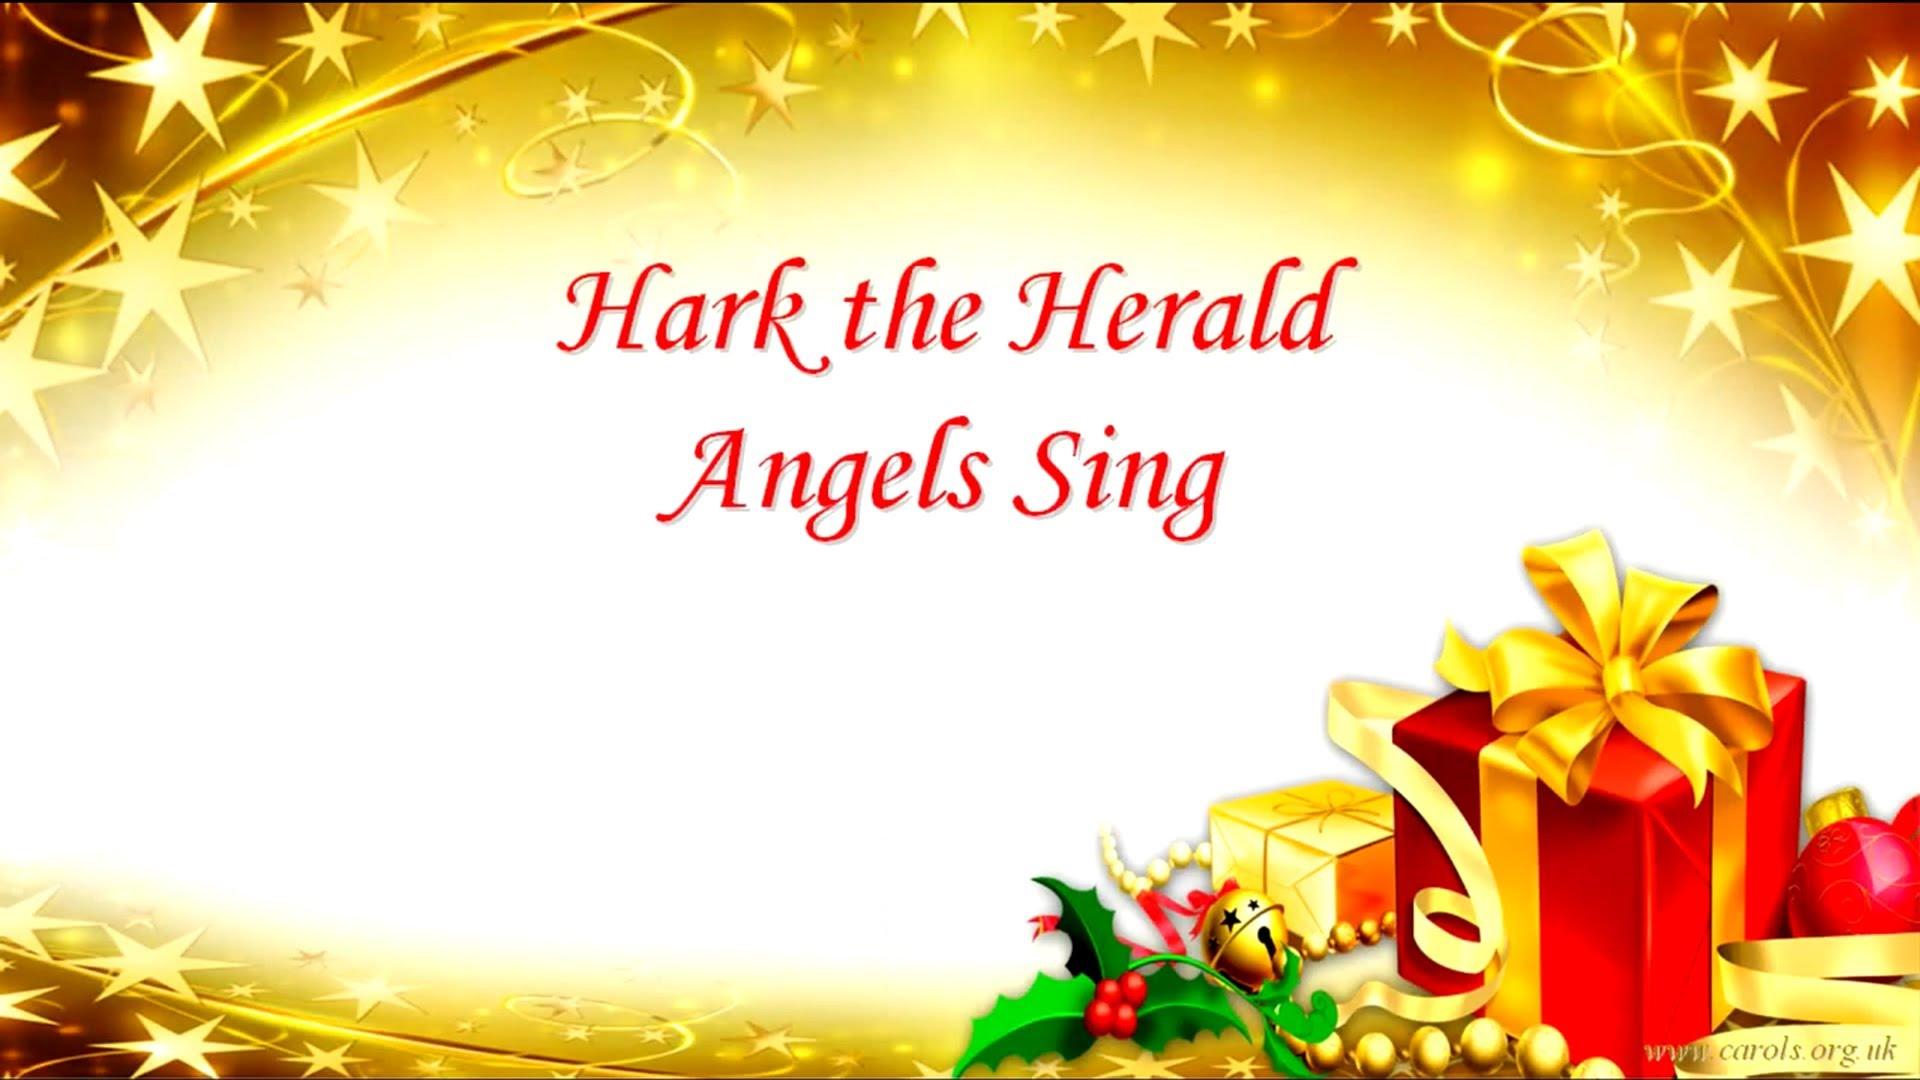 HARK THE HERALD ANGELS SING Lyrics | ALL CHRISTMAS MUSIC | Pinterest ...